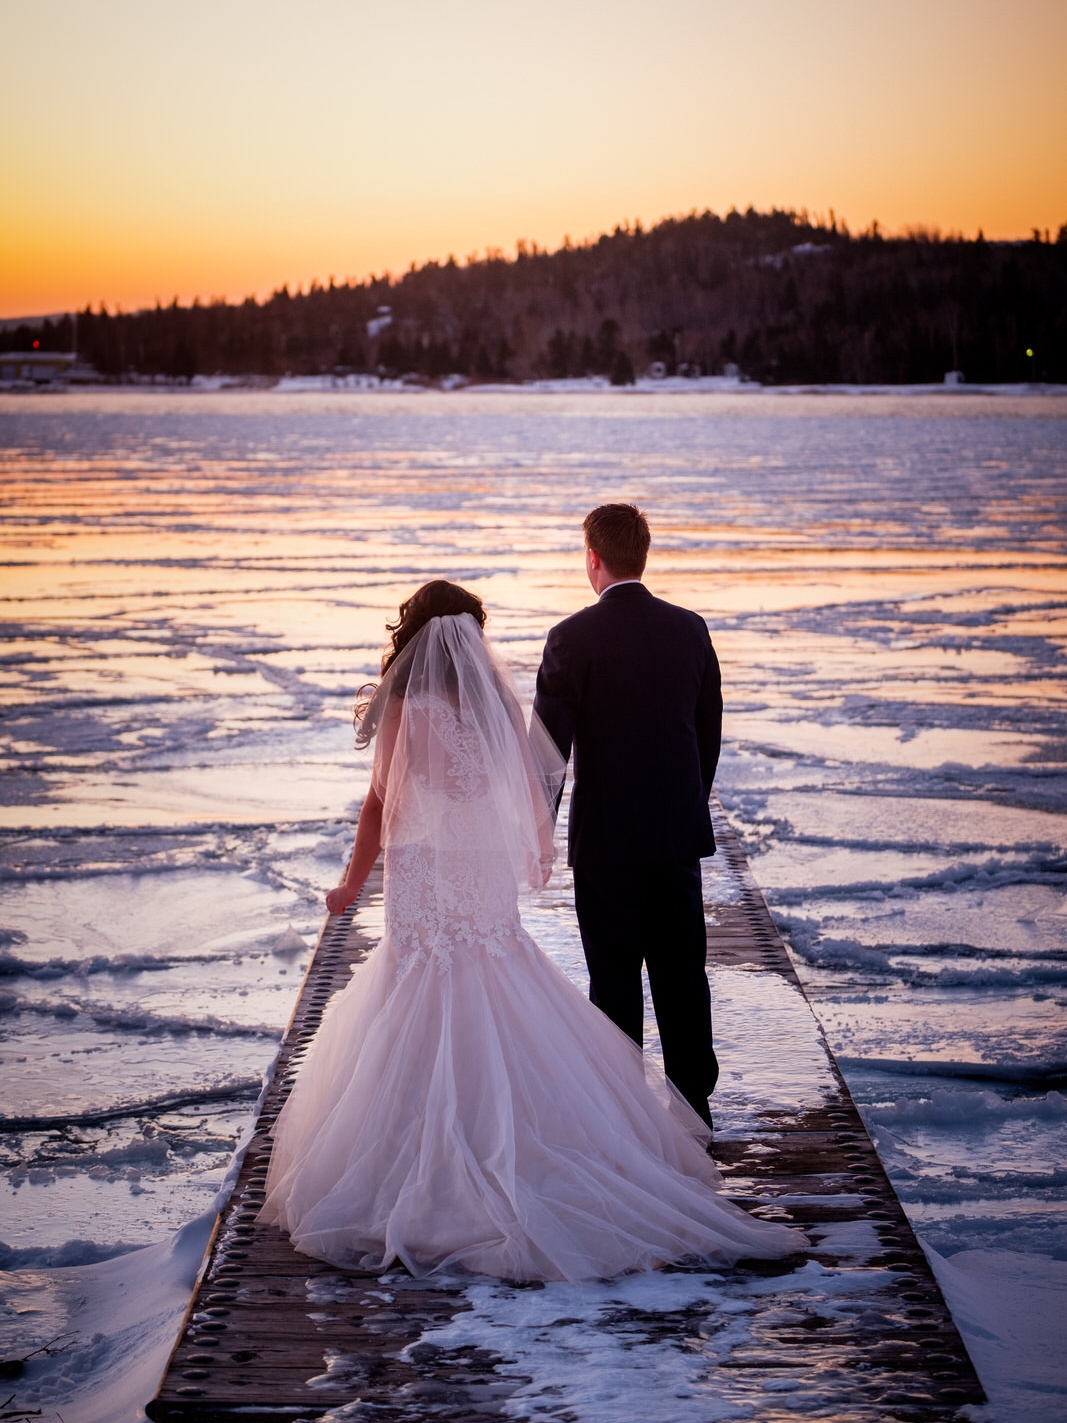 north shore winter wedding photographer